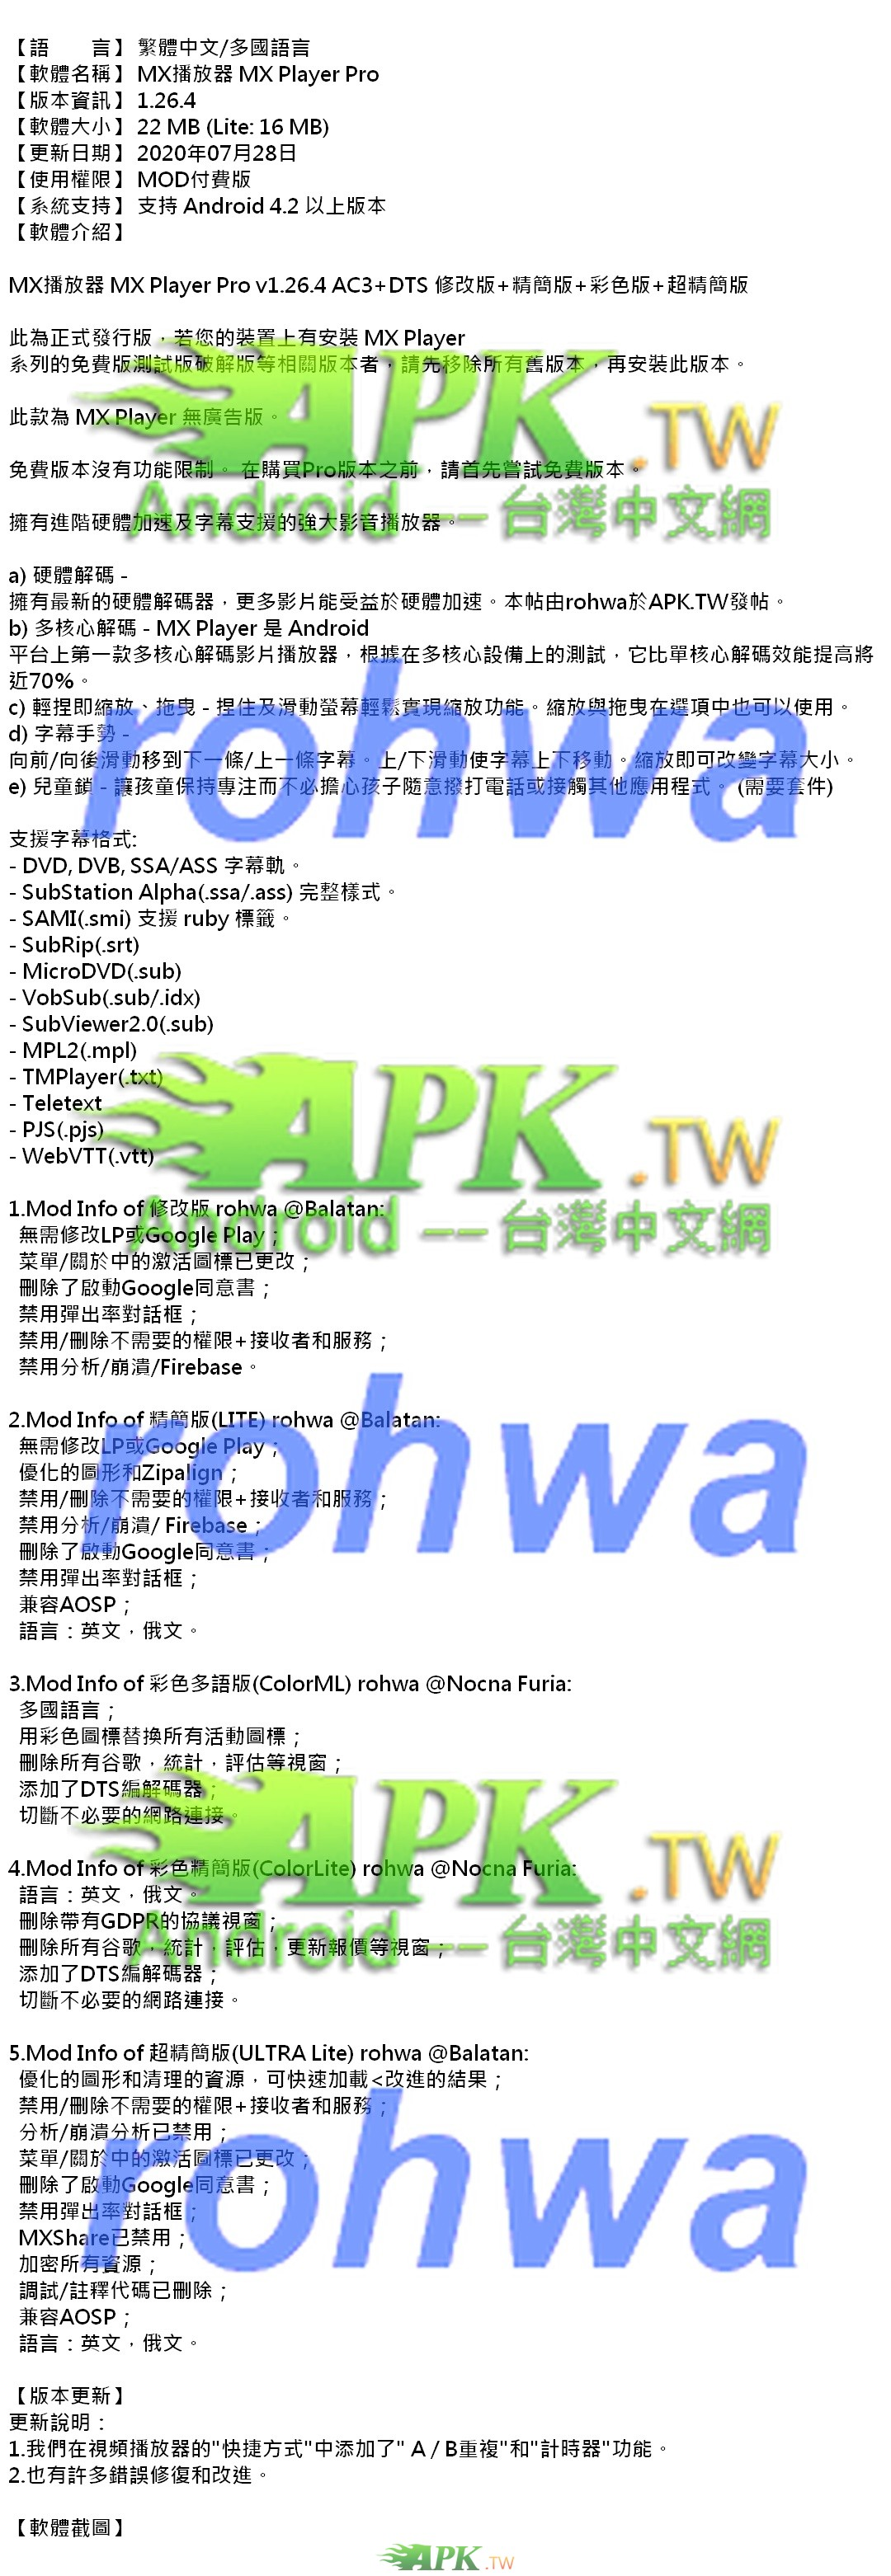 MX_Player_Pro_1.26.4 APK_Add_ULTRA_Lite_.jpg